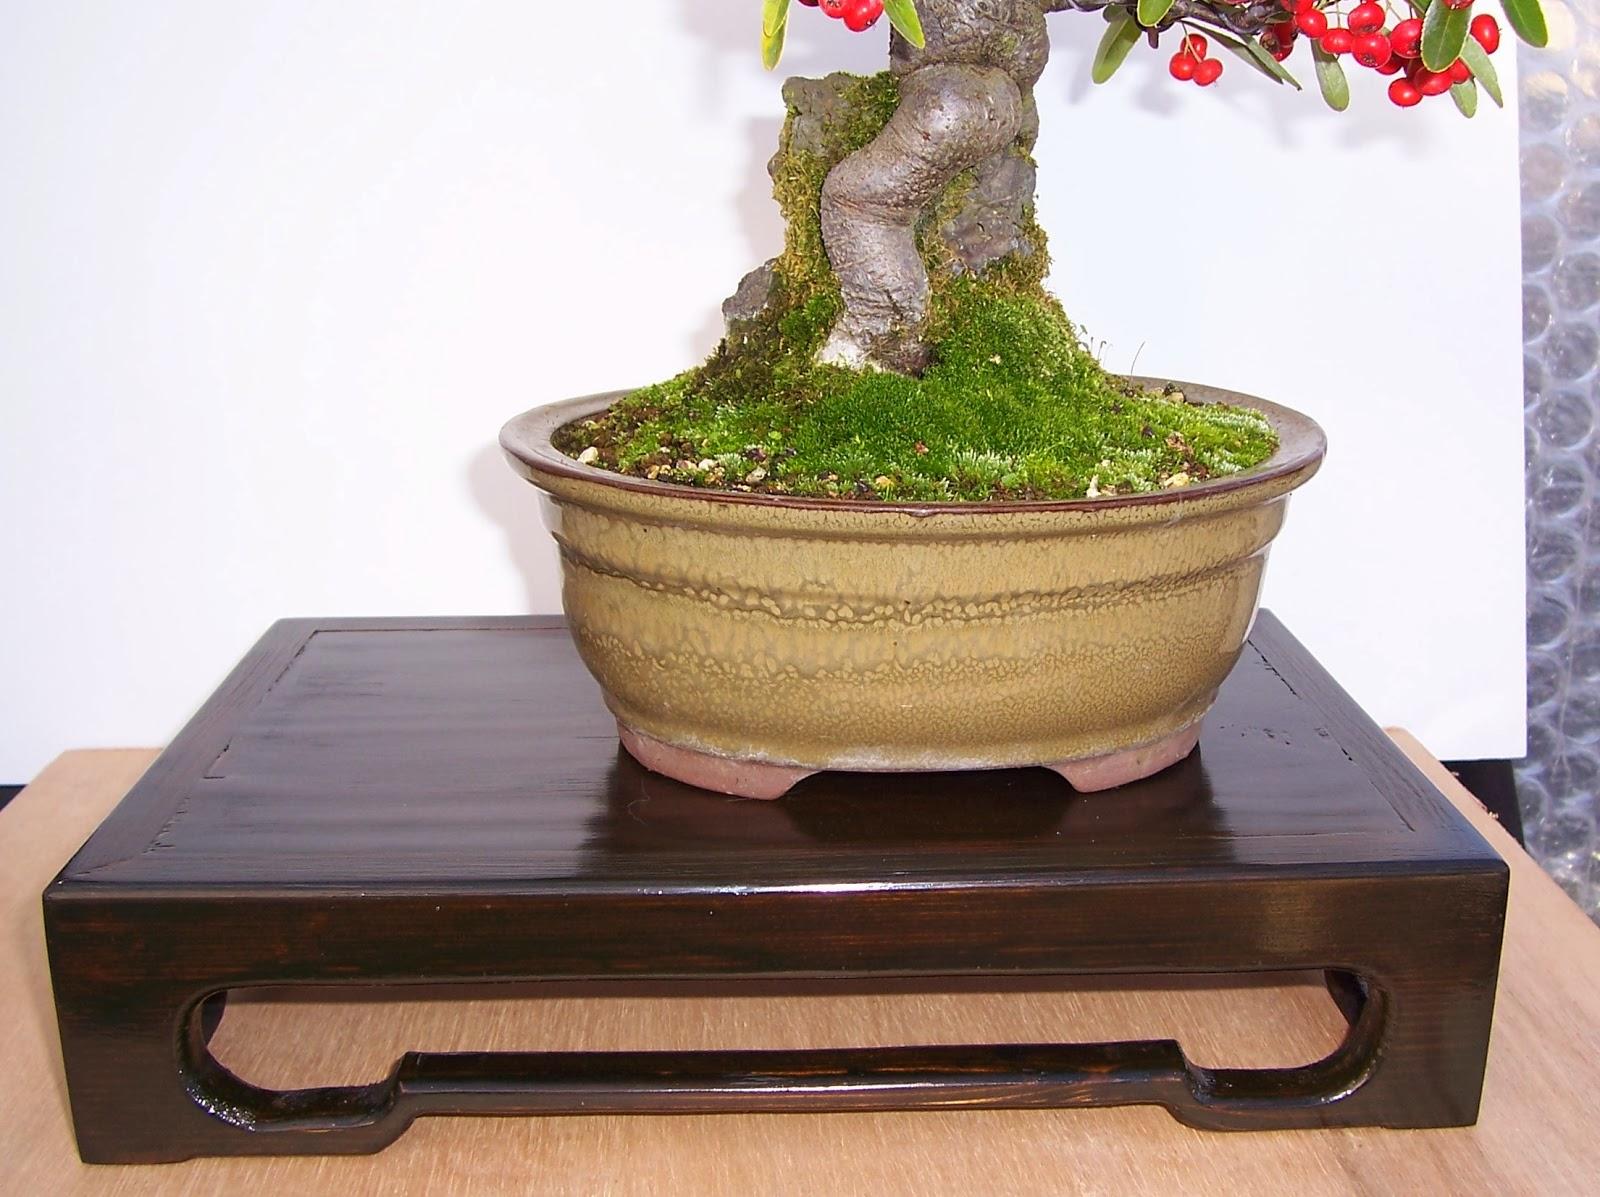 MiKo Bonsai Homemade Bonsai Display Stand Finished